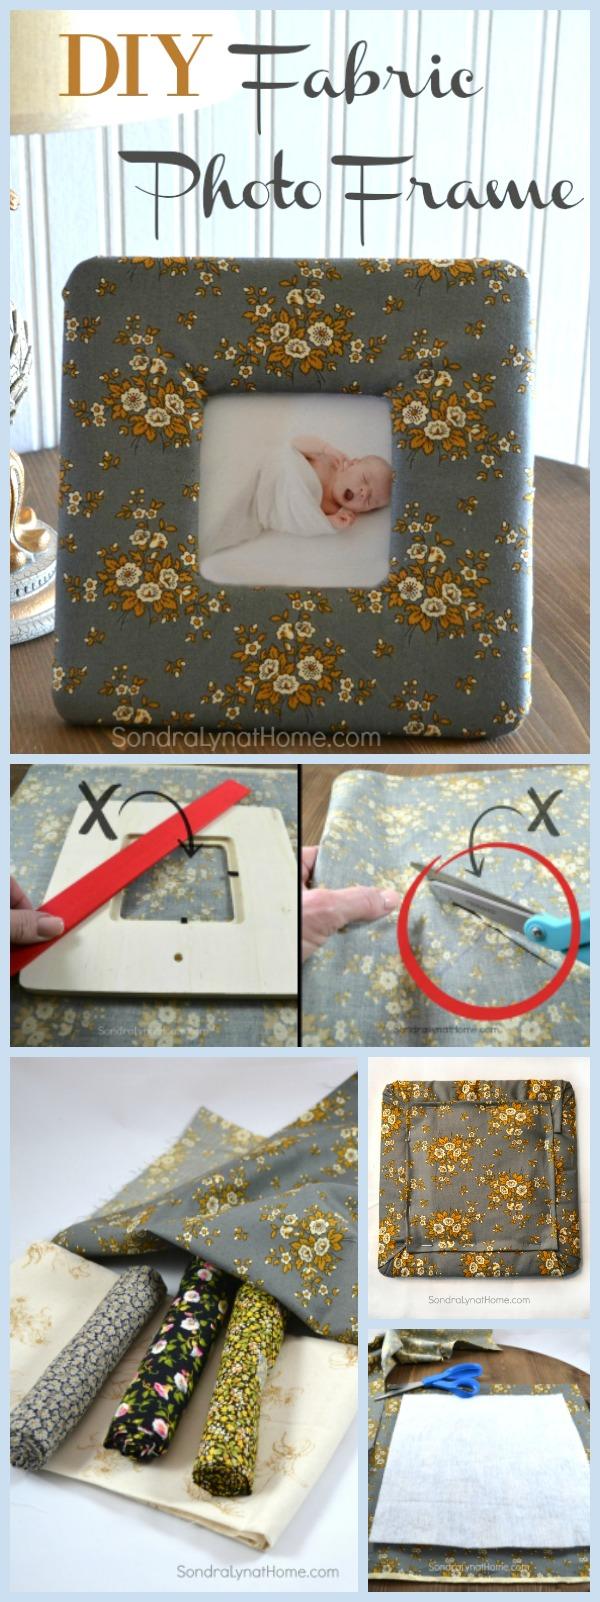 DIY Fabric Photo Frame - Pinnable - Sondra Lyn at Home.com